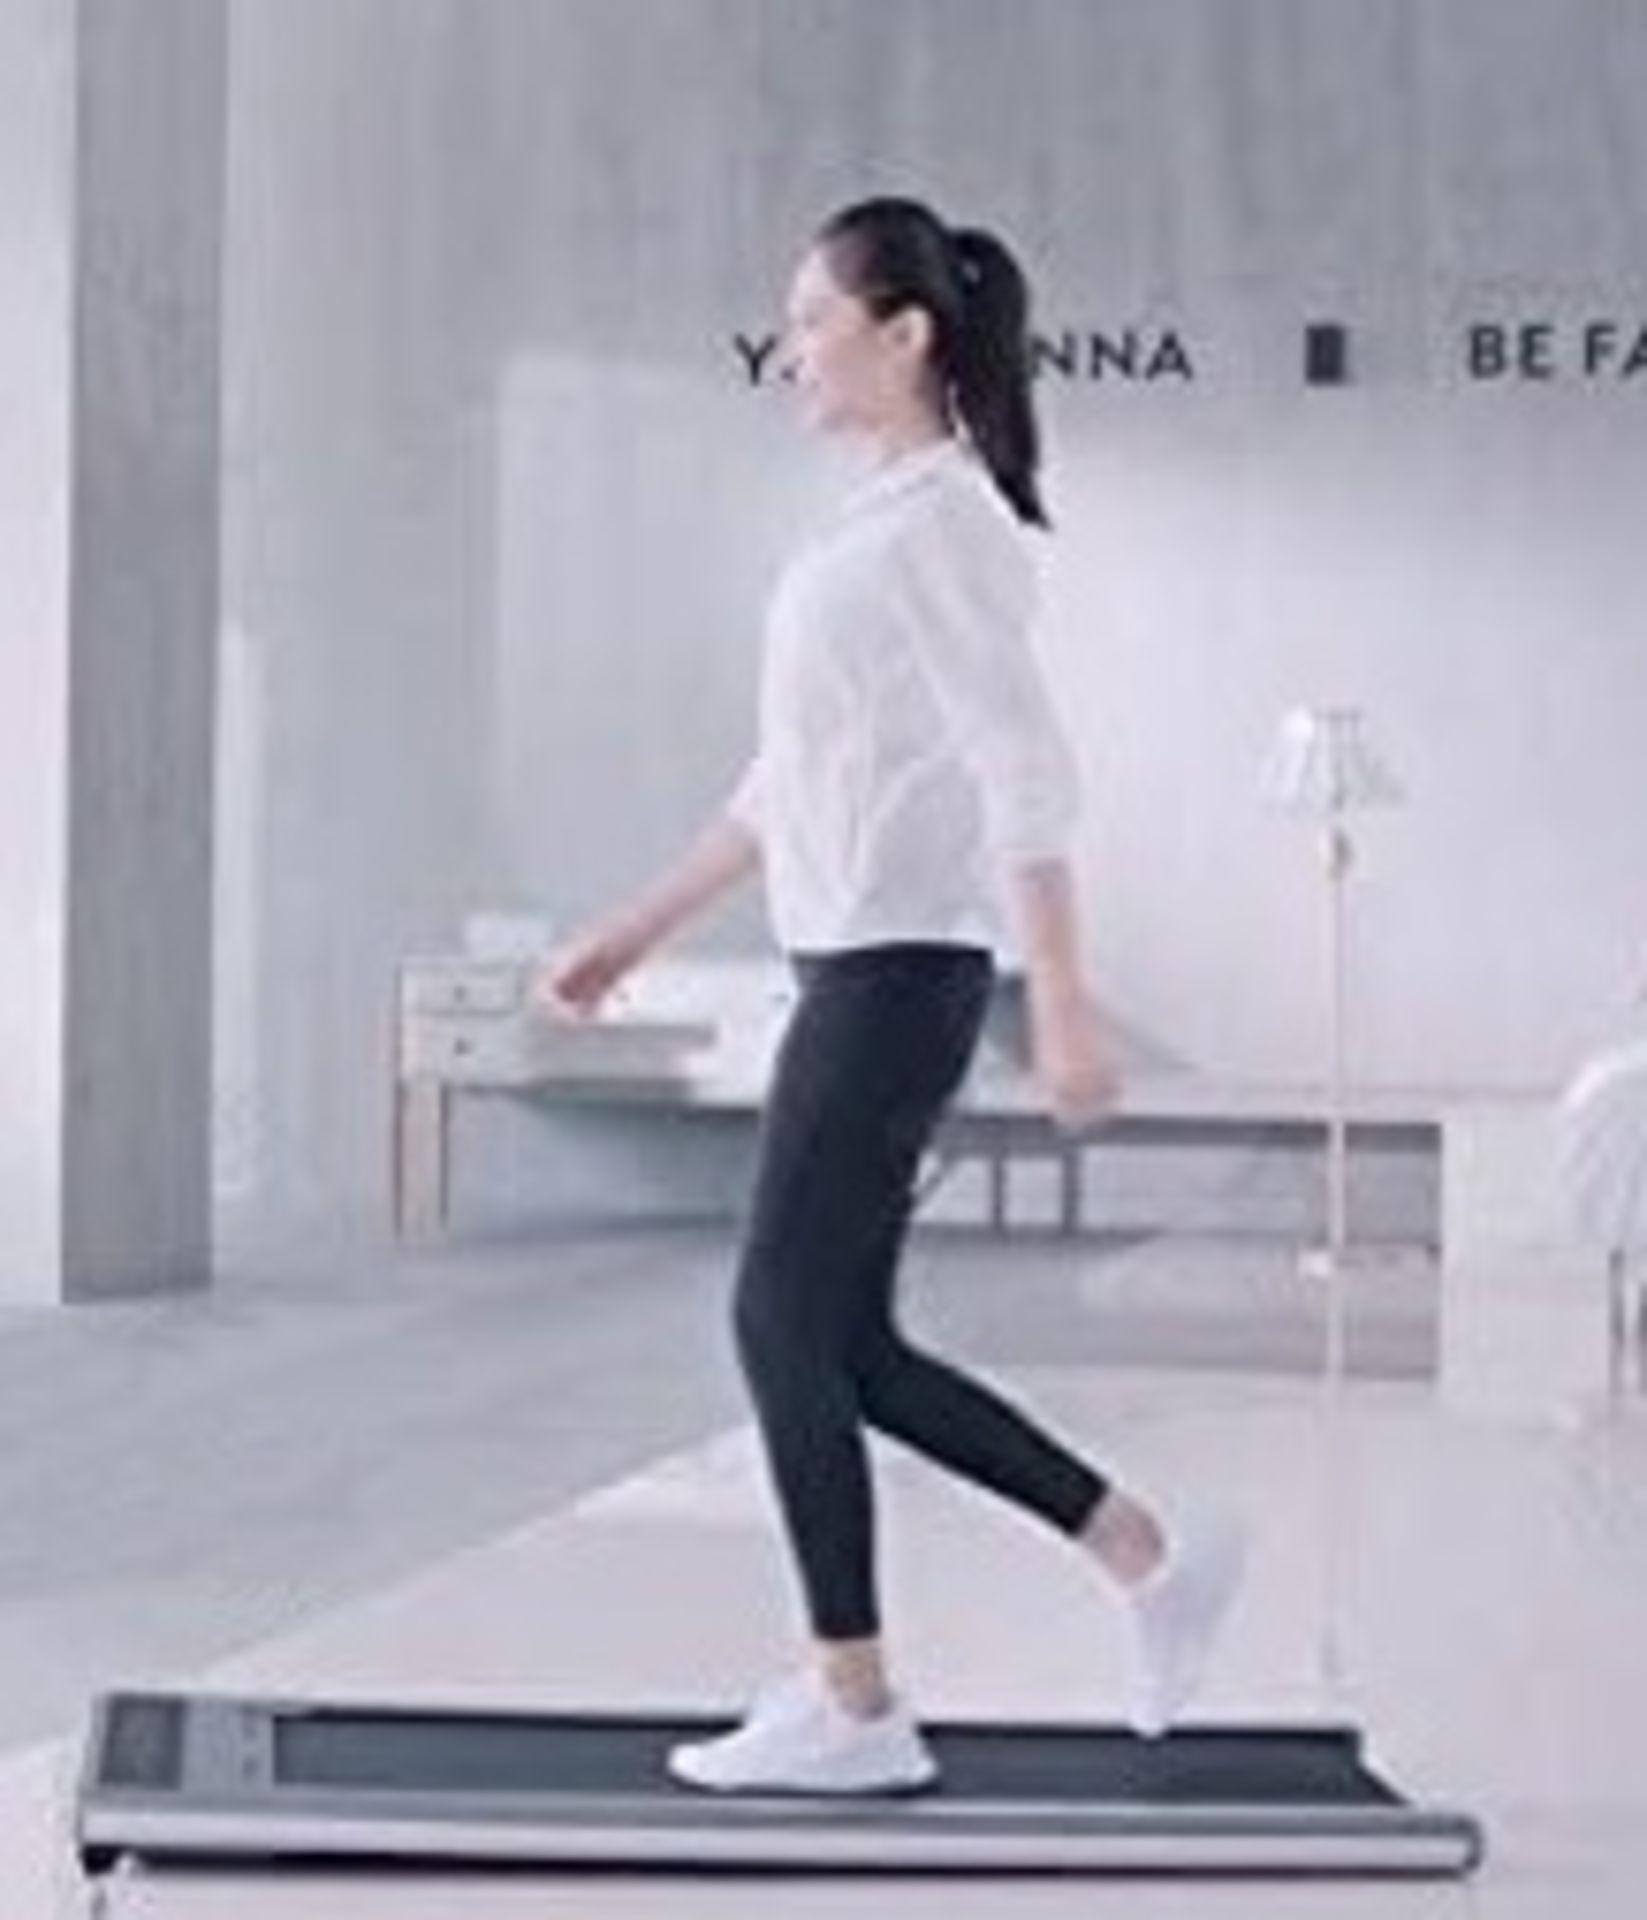 1 x Slim Tread Ultra Thin Smart Treadmill Running / Walking Machine - Lightweight With Folding - Image 2 of 23